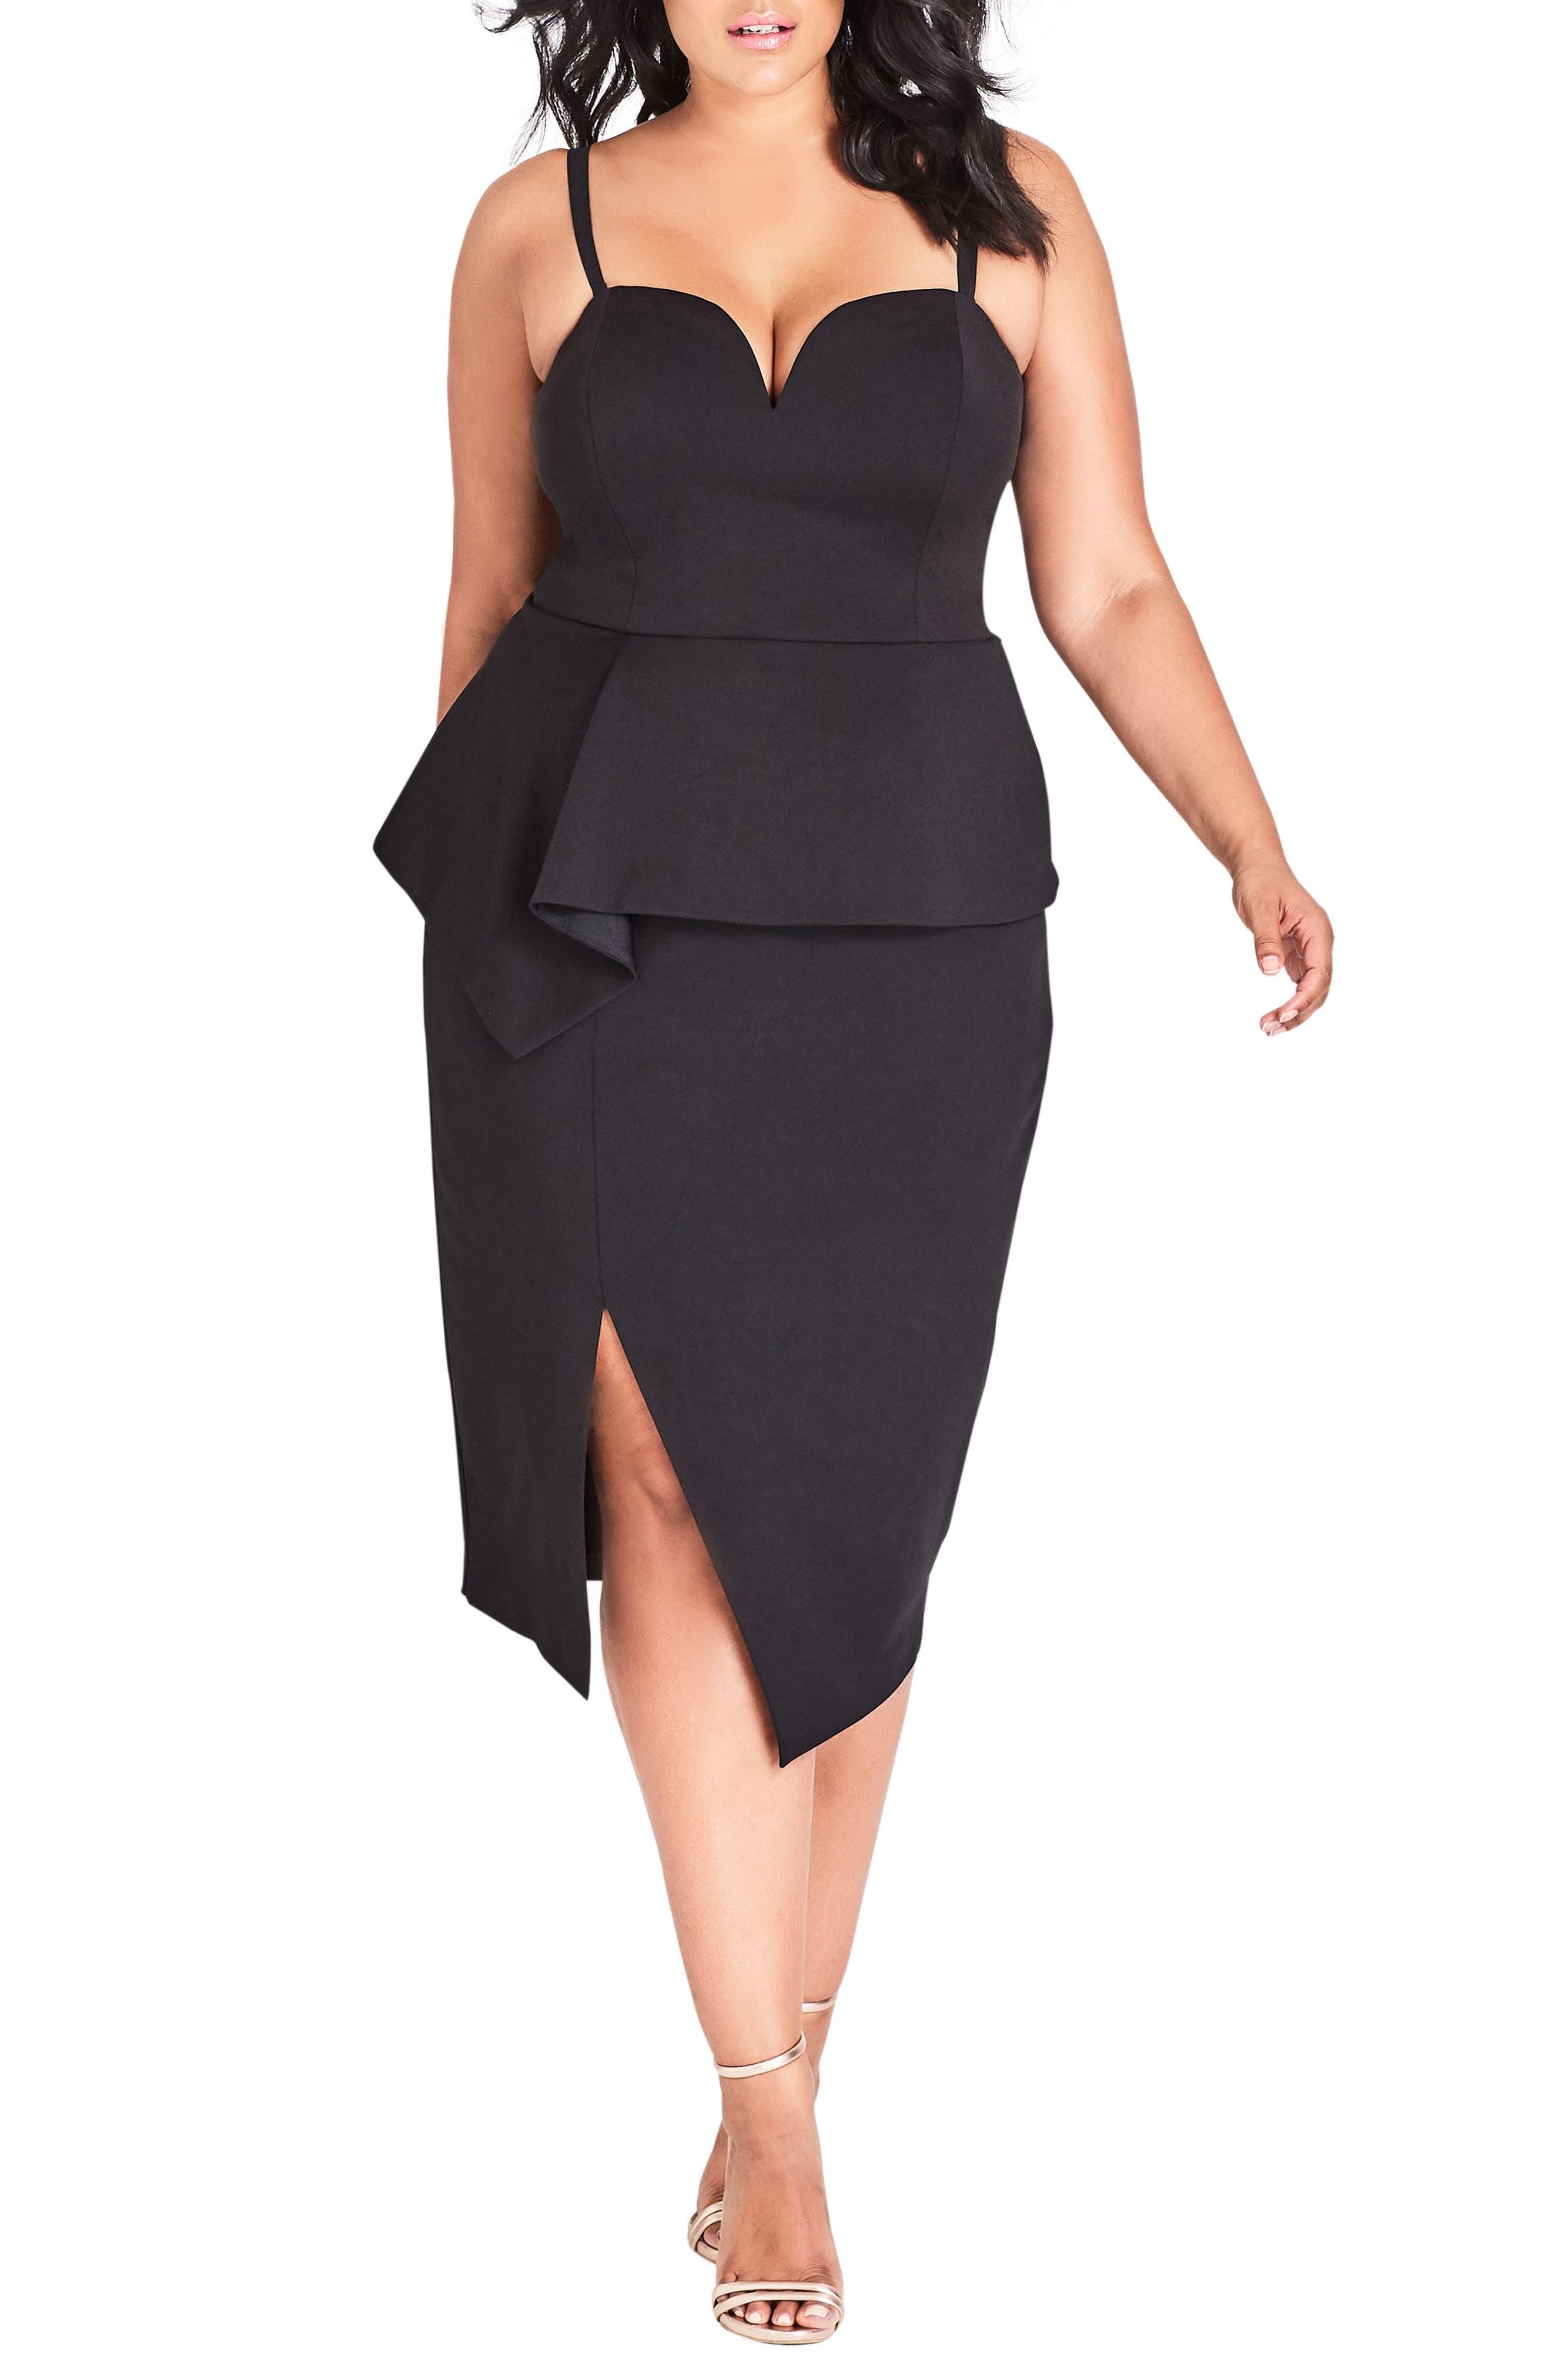 Screen Siren Dress,                             Main thumbnail 1, color,                             Black